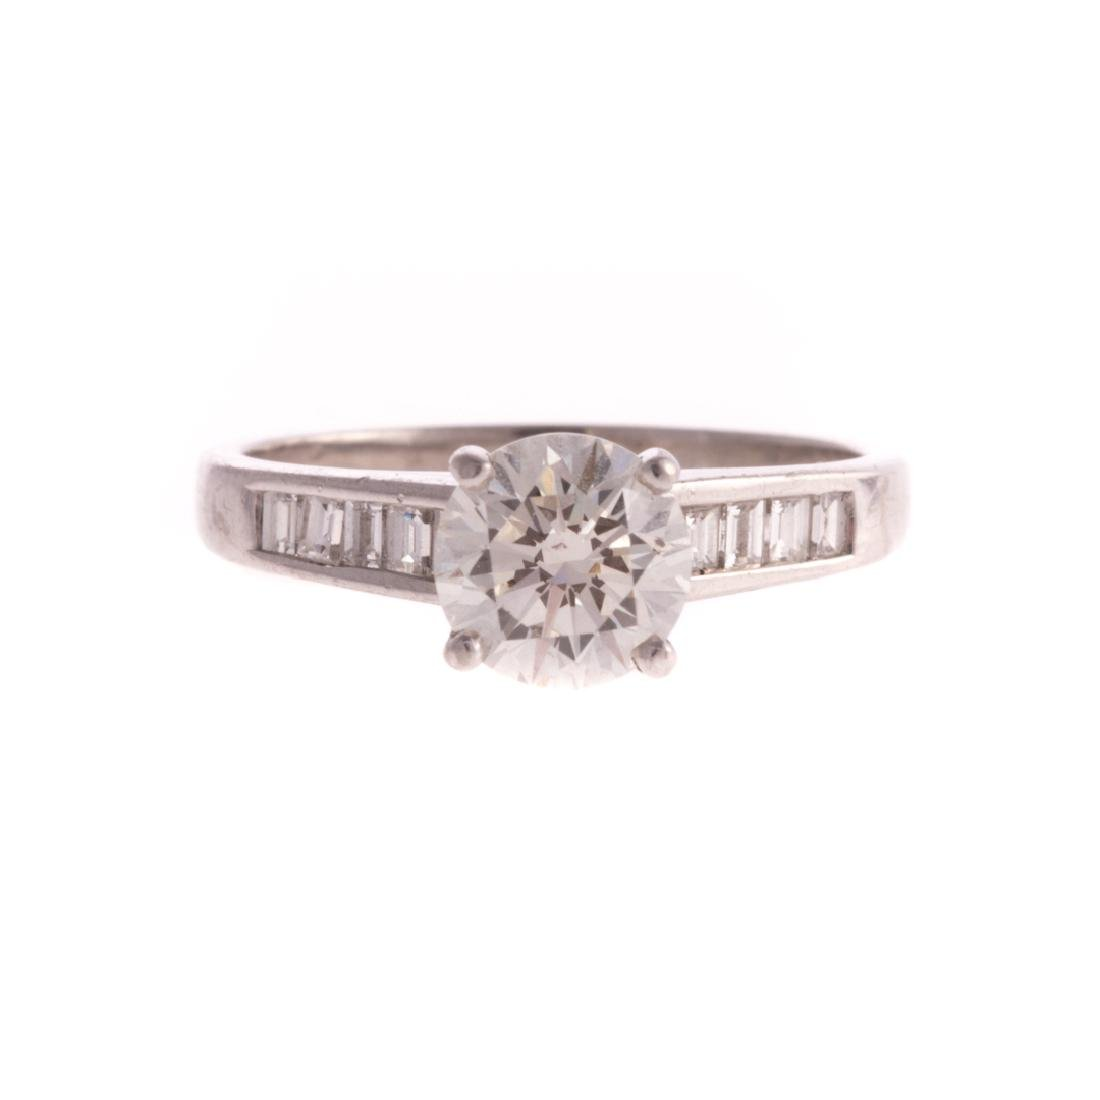 A 1.22ct Round Diamond Engagement Ring in Platinum